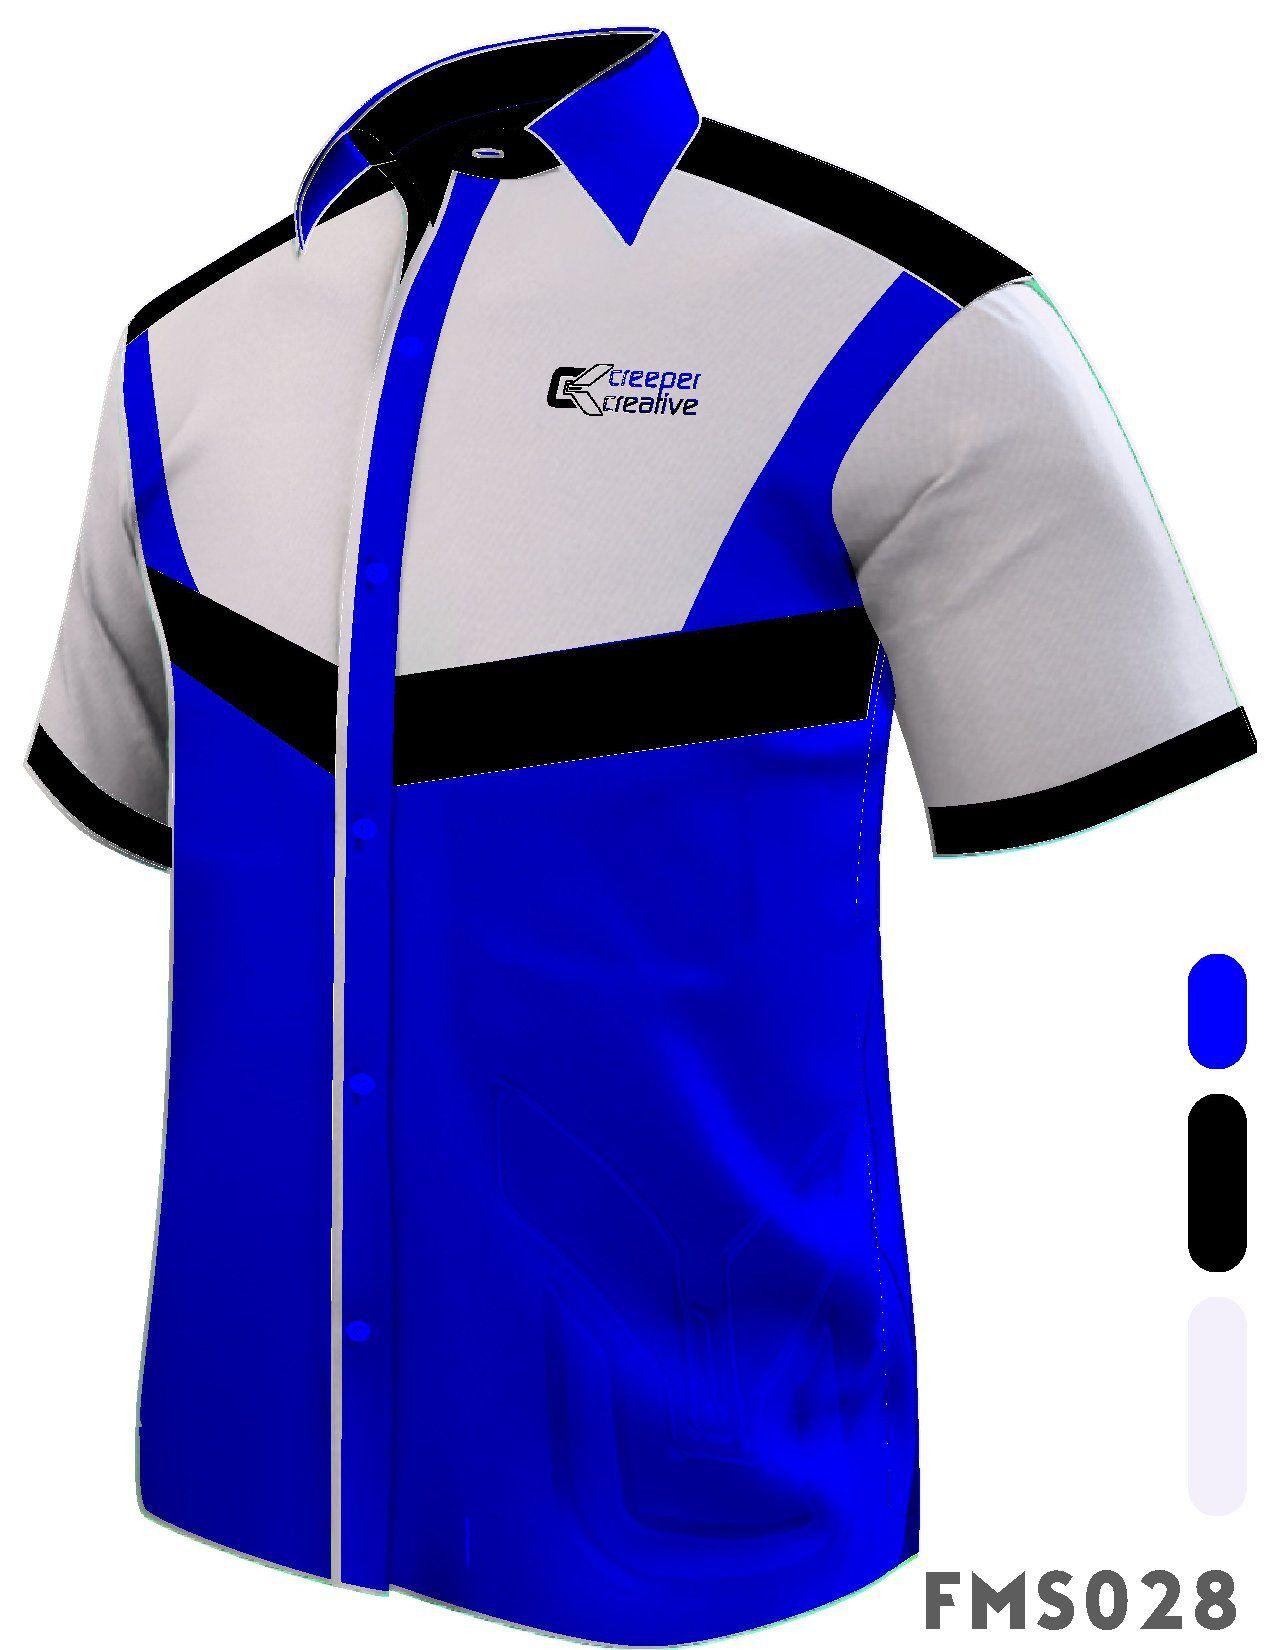 Fms028 F1 Shirts Male Shirts Short Sleeve Corporate Shirts